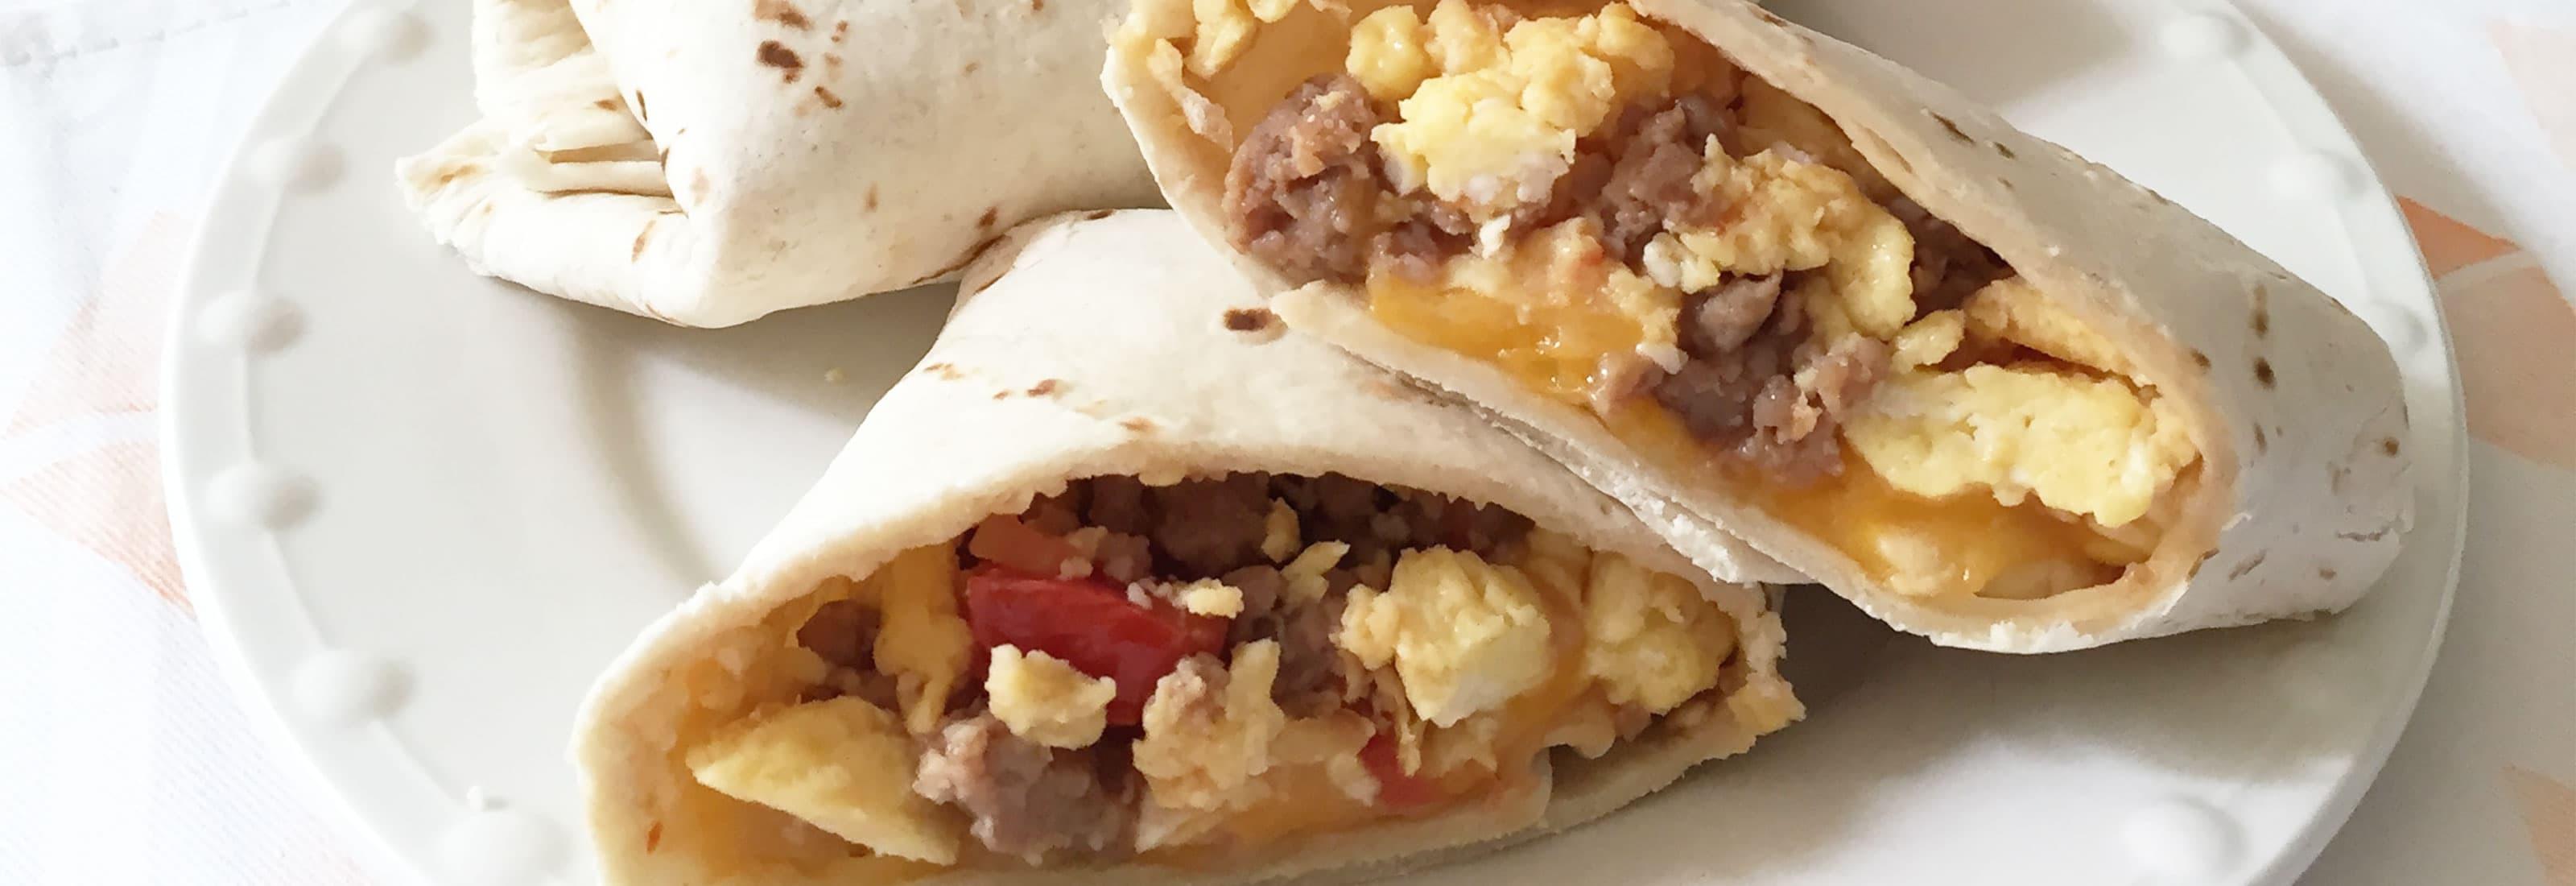 Make Ahead Breakfast Burrito Recipes  Make Ahead Turkey Sausage Breakfast Burrito